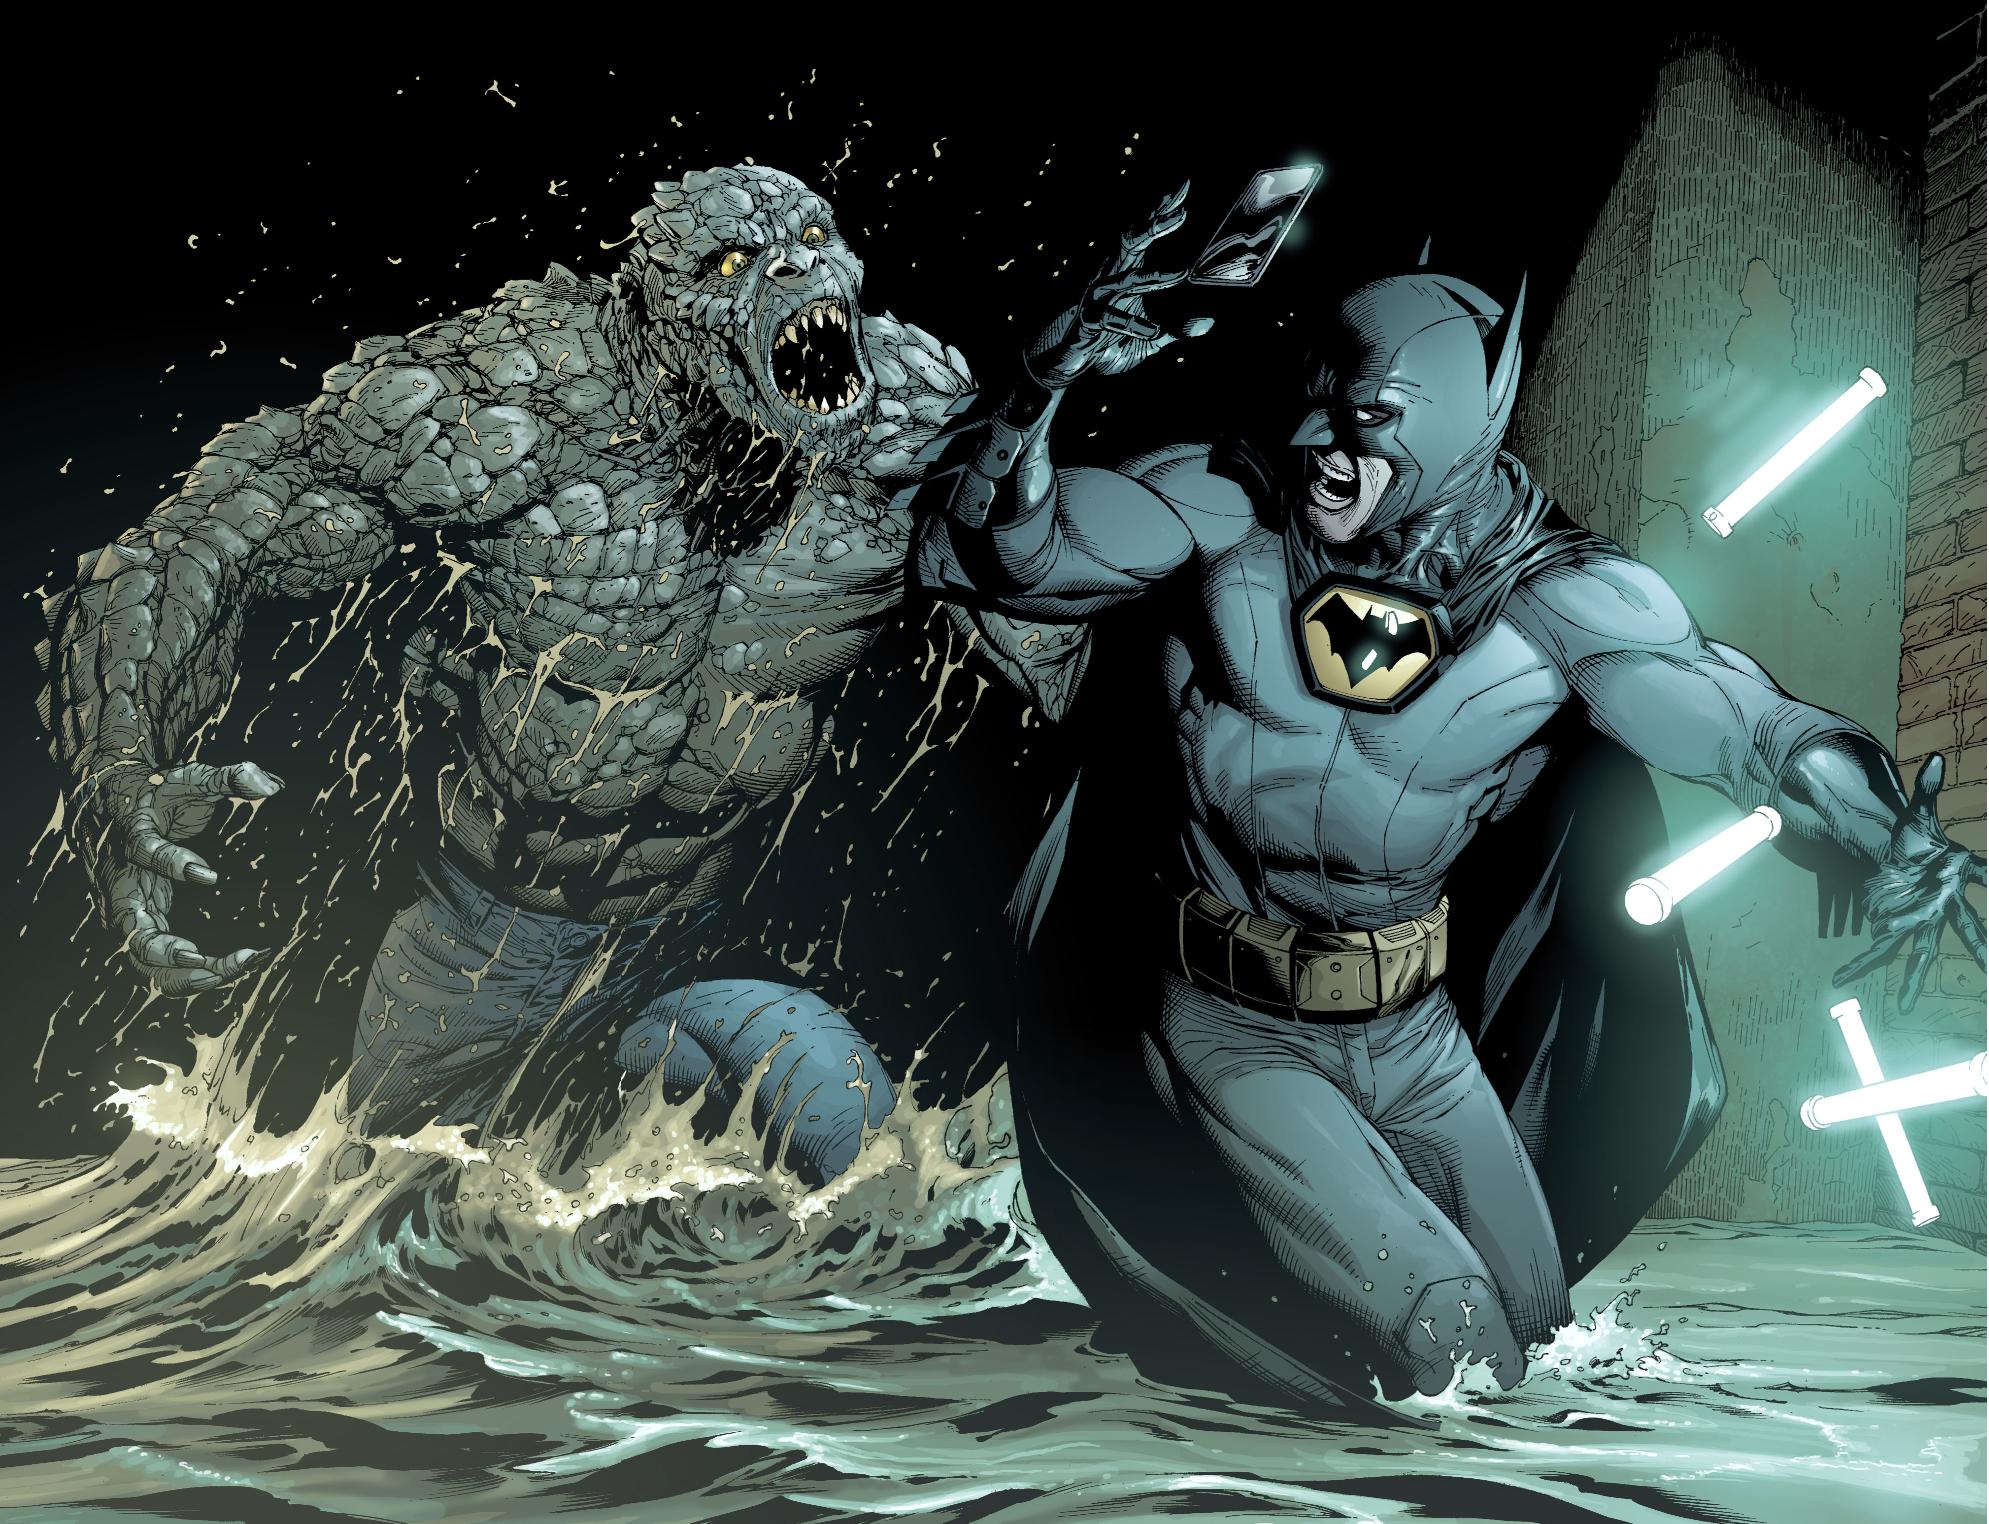 batman-vs-killer-croc-earth-one-1